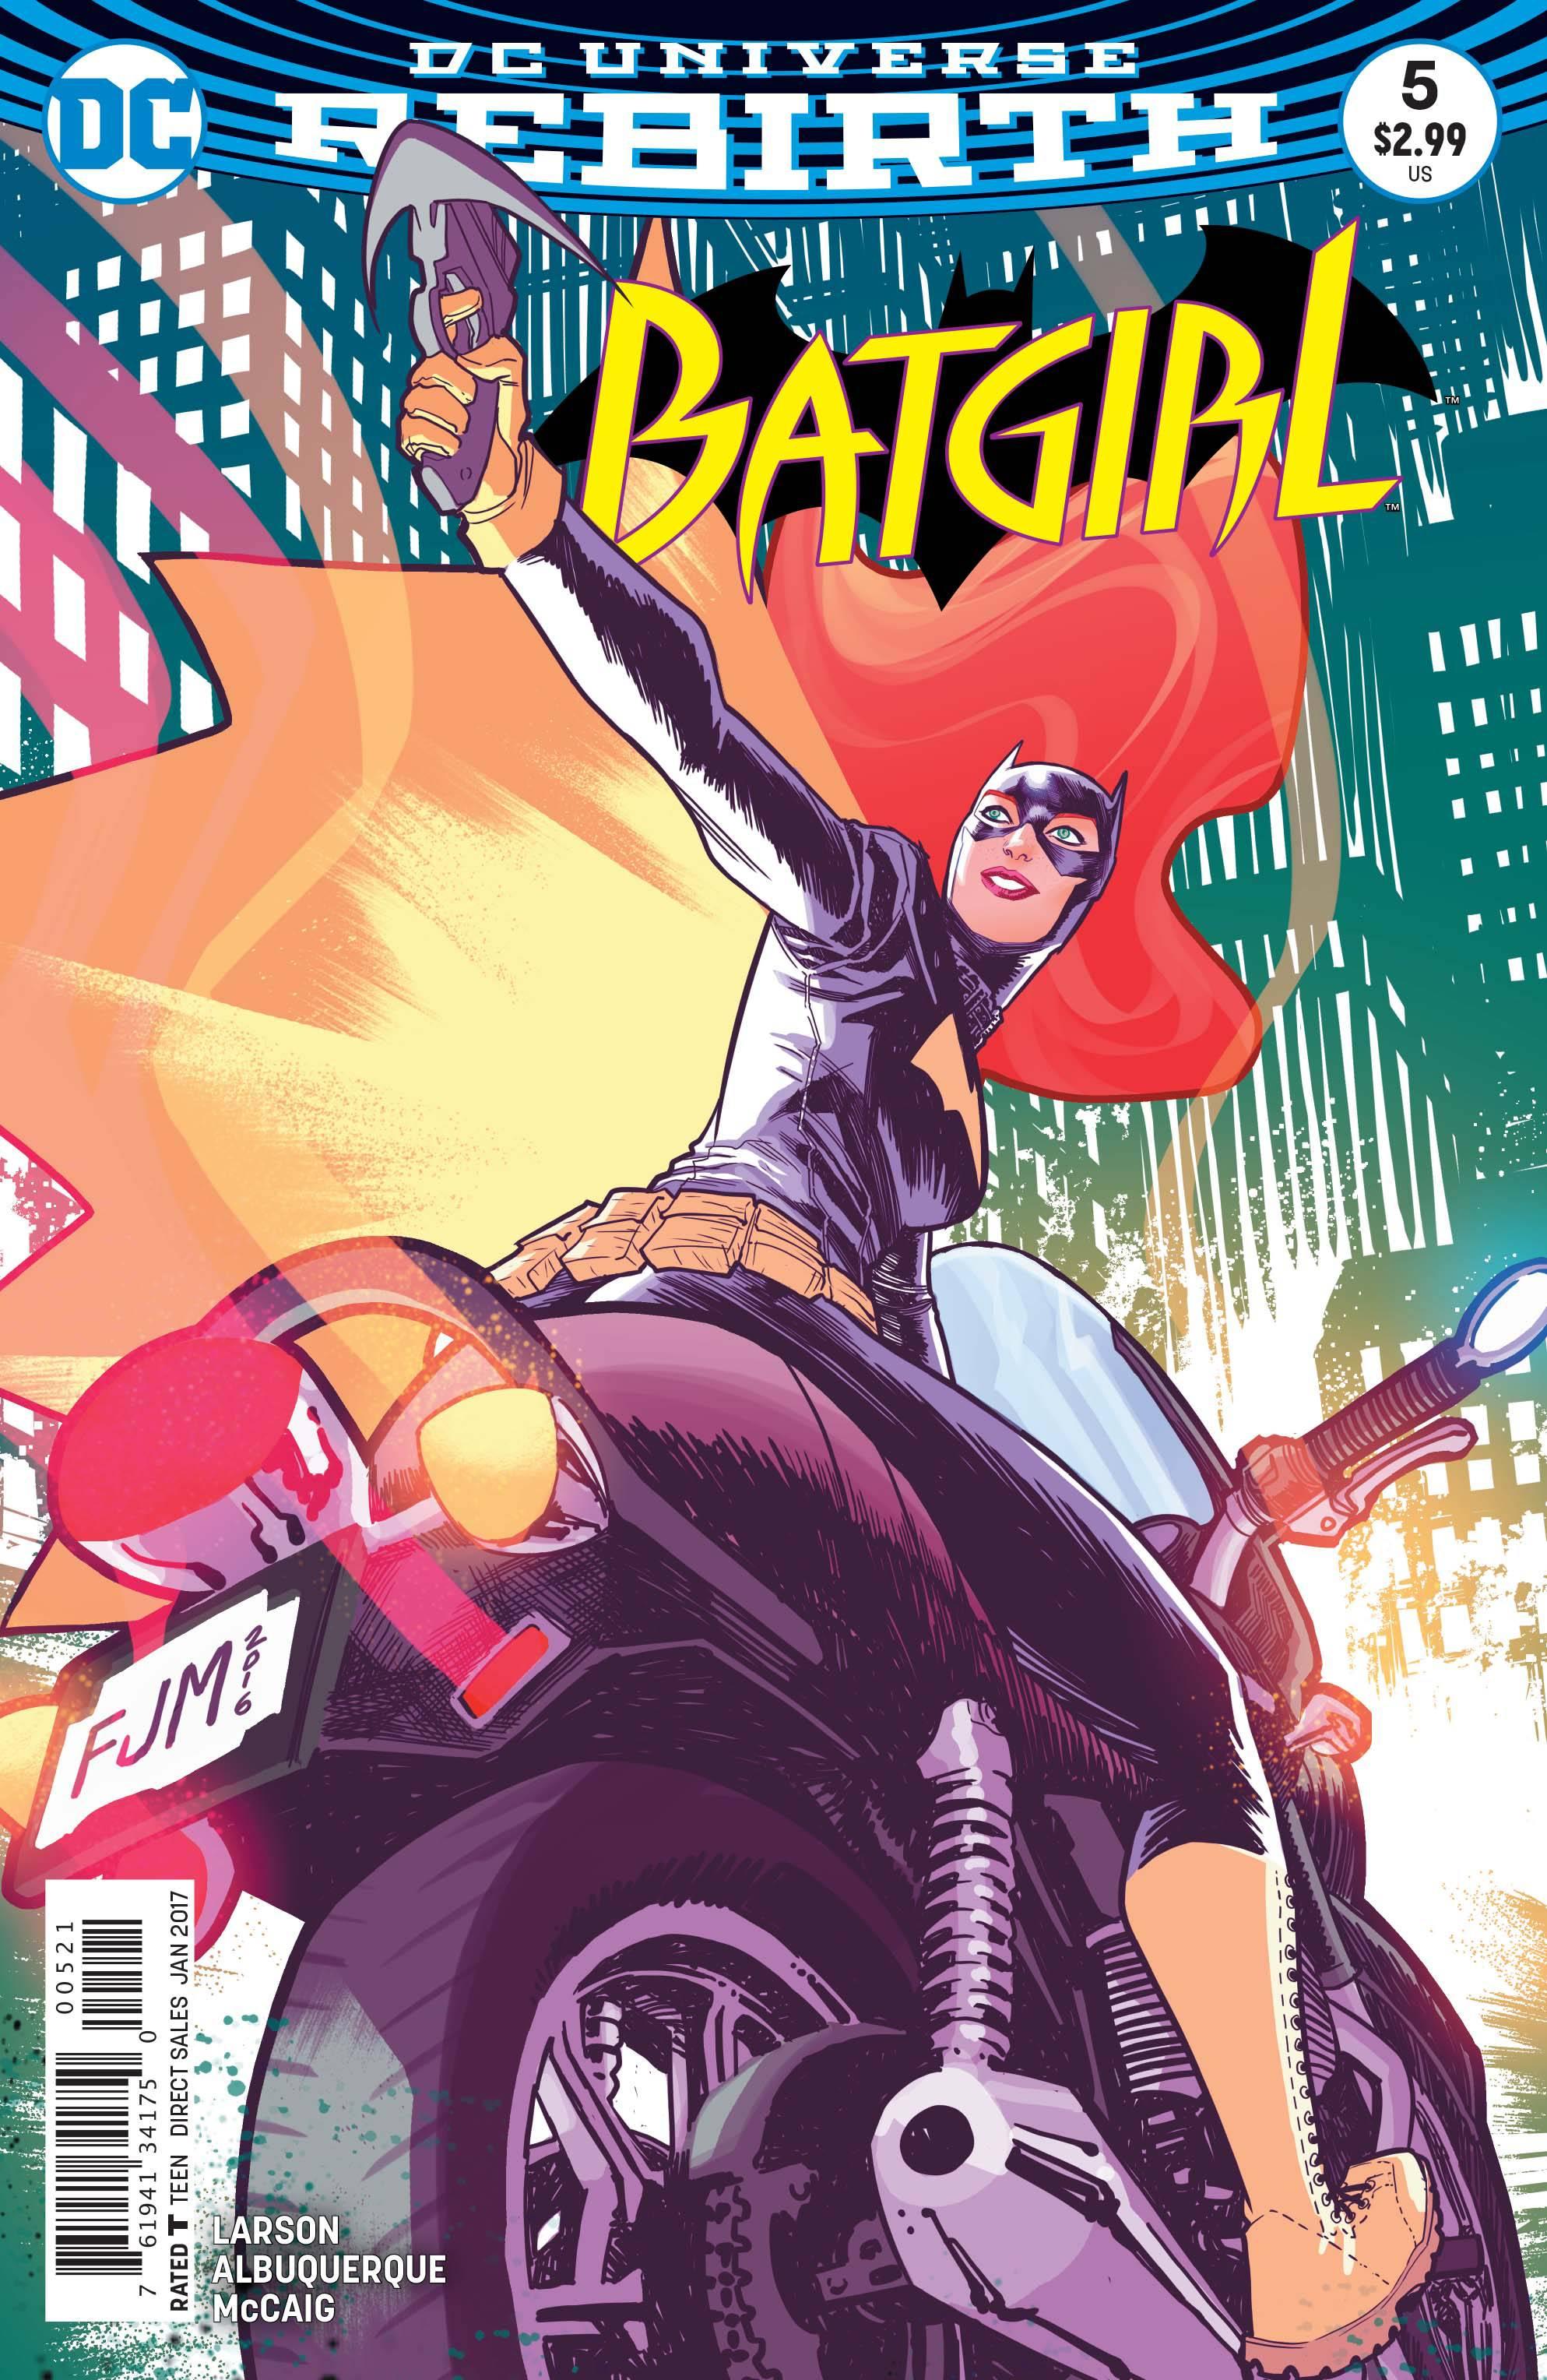 Batgirl #5 Var Ed